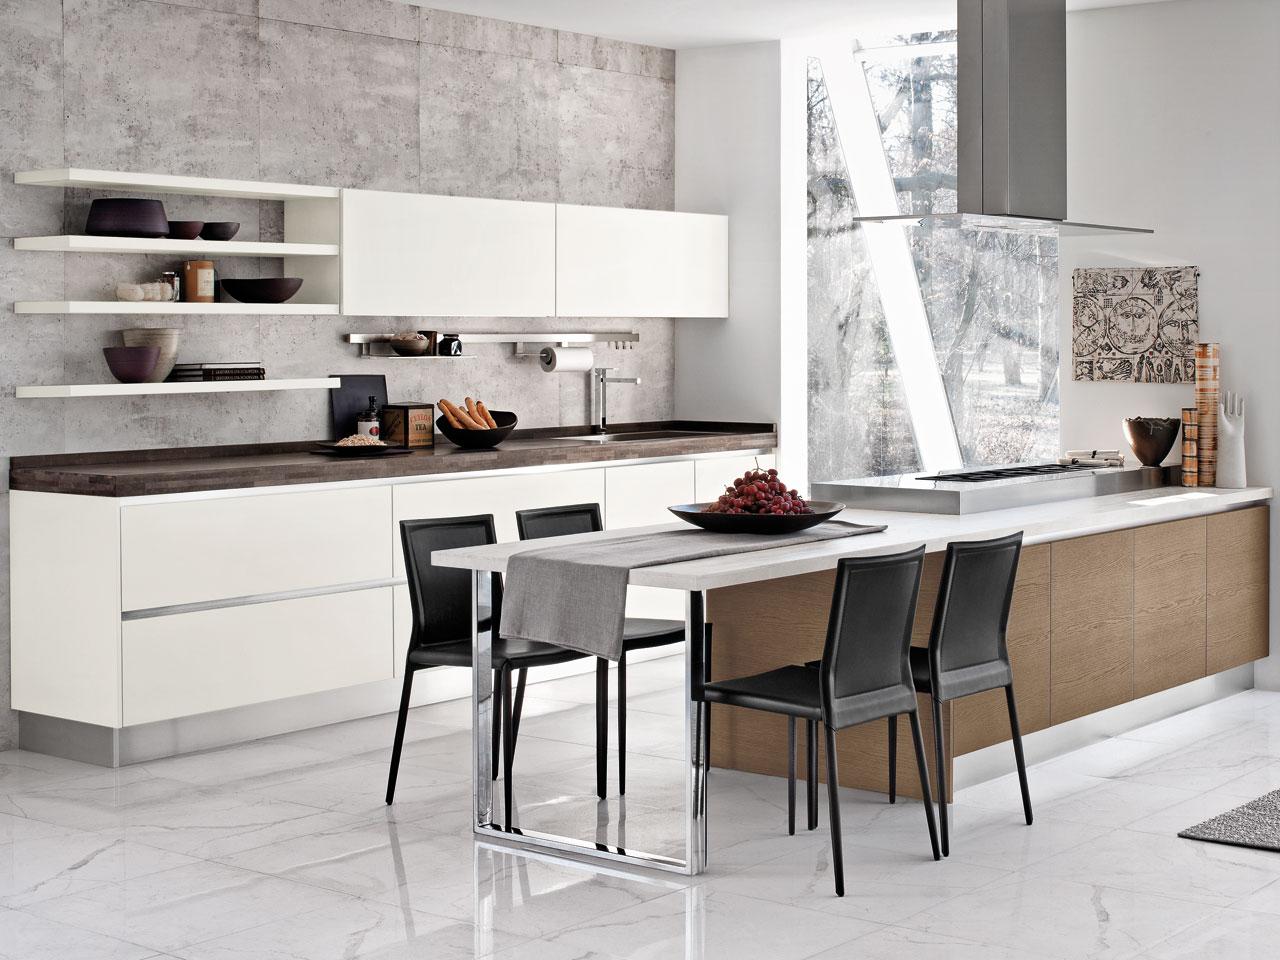 Cucina Brava Lube : Cucina lube brava rovere caffè bianco arredamenti papa a